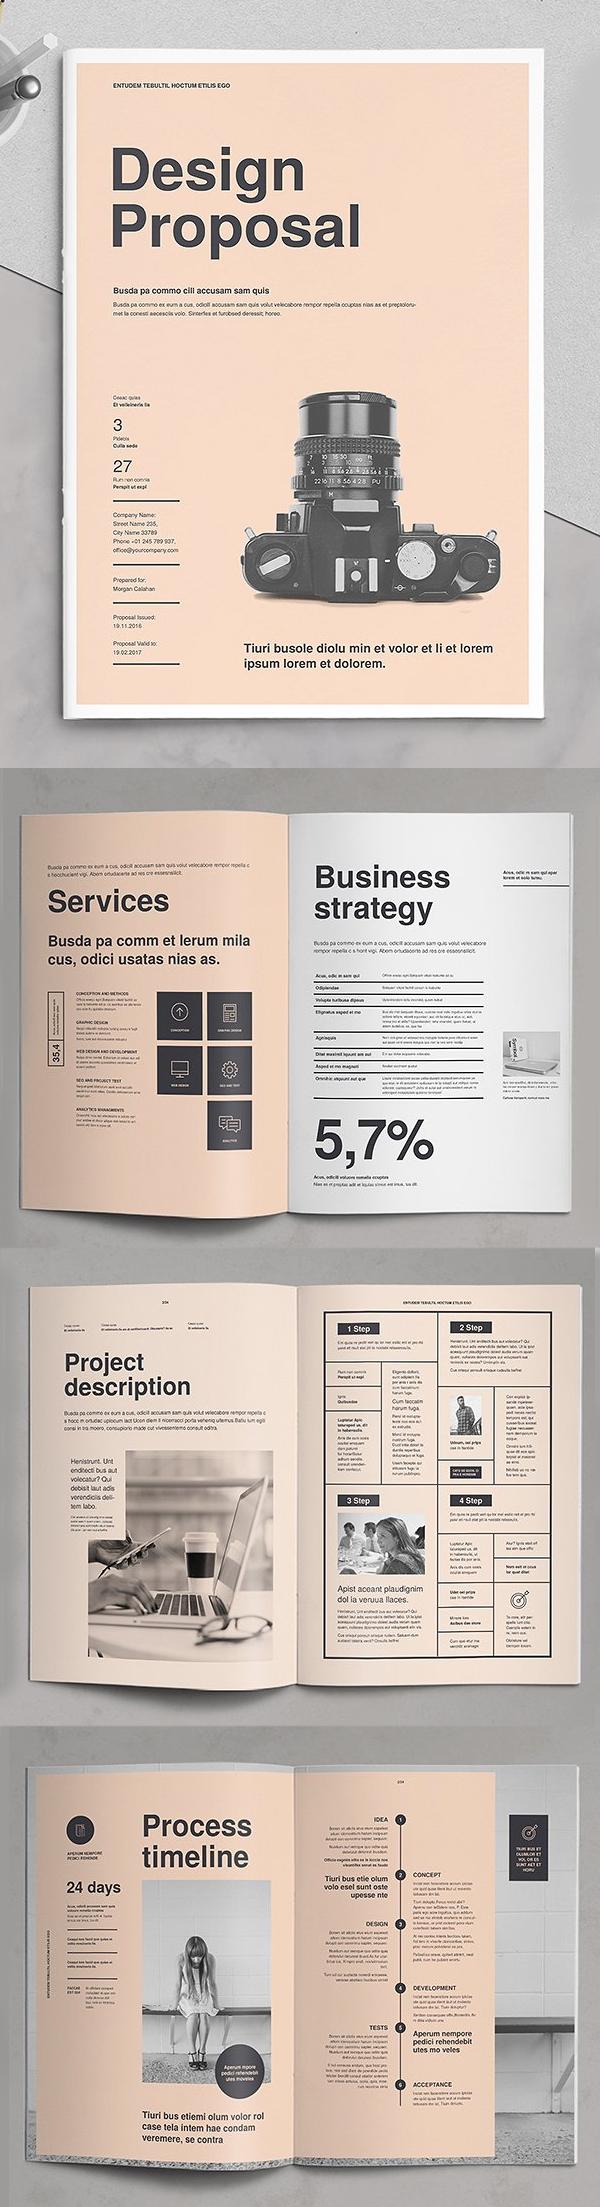 Professional Business Proposal Templates Design - 2